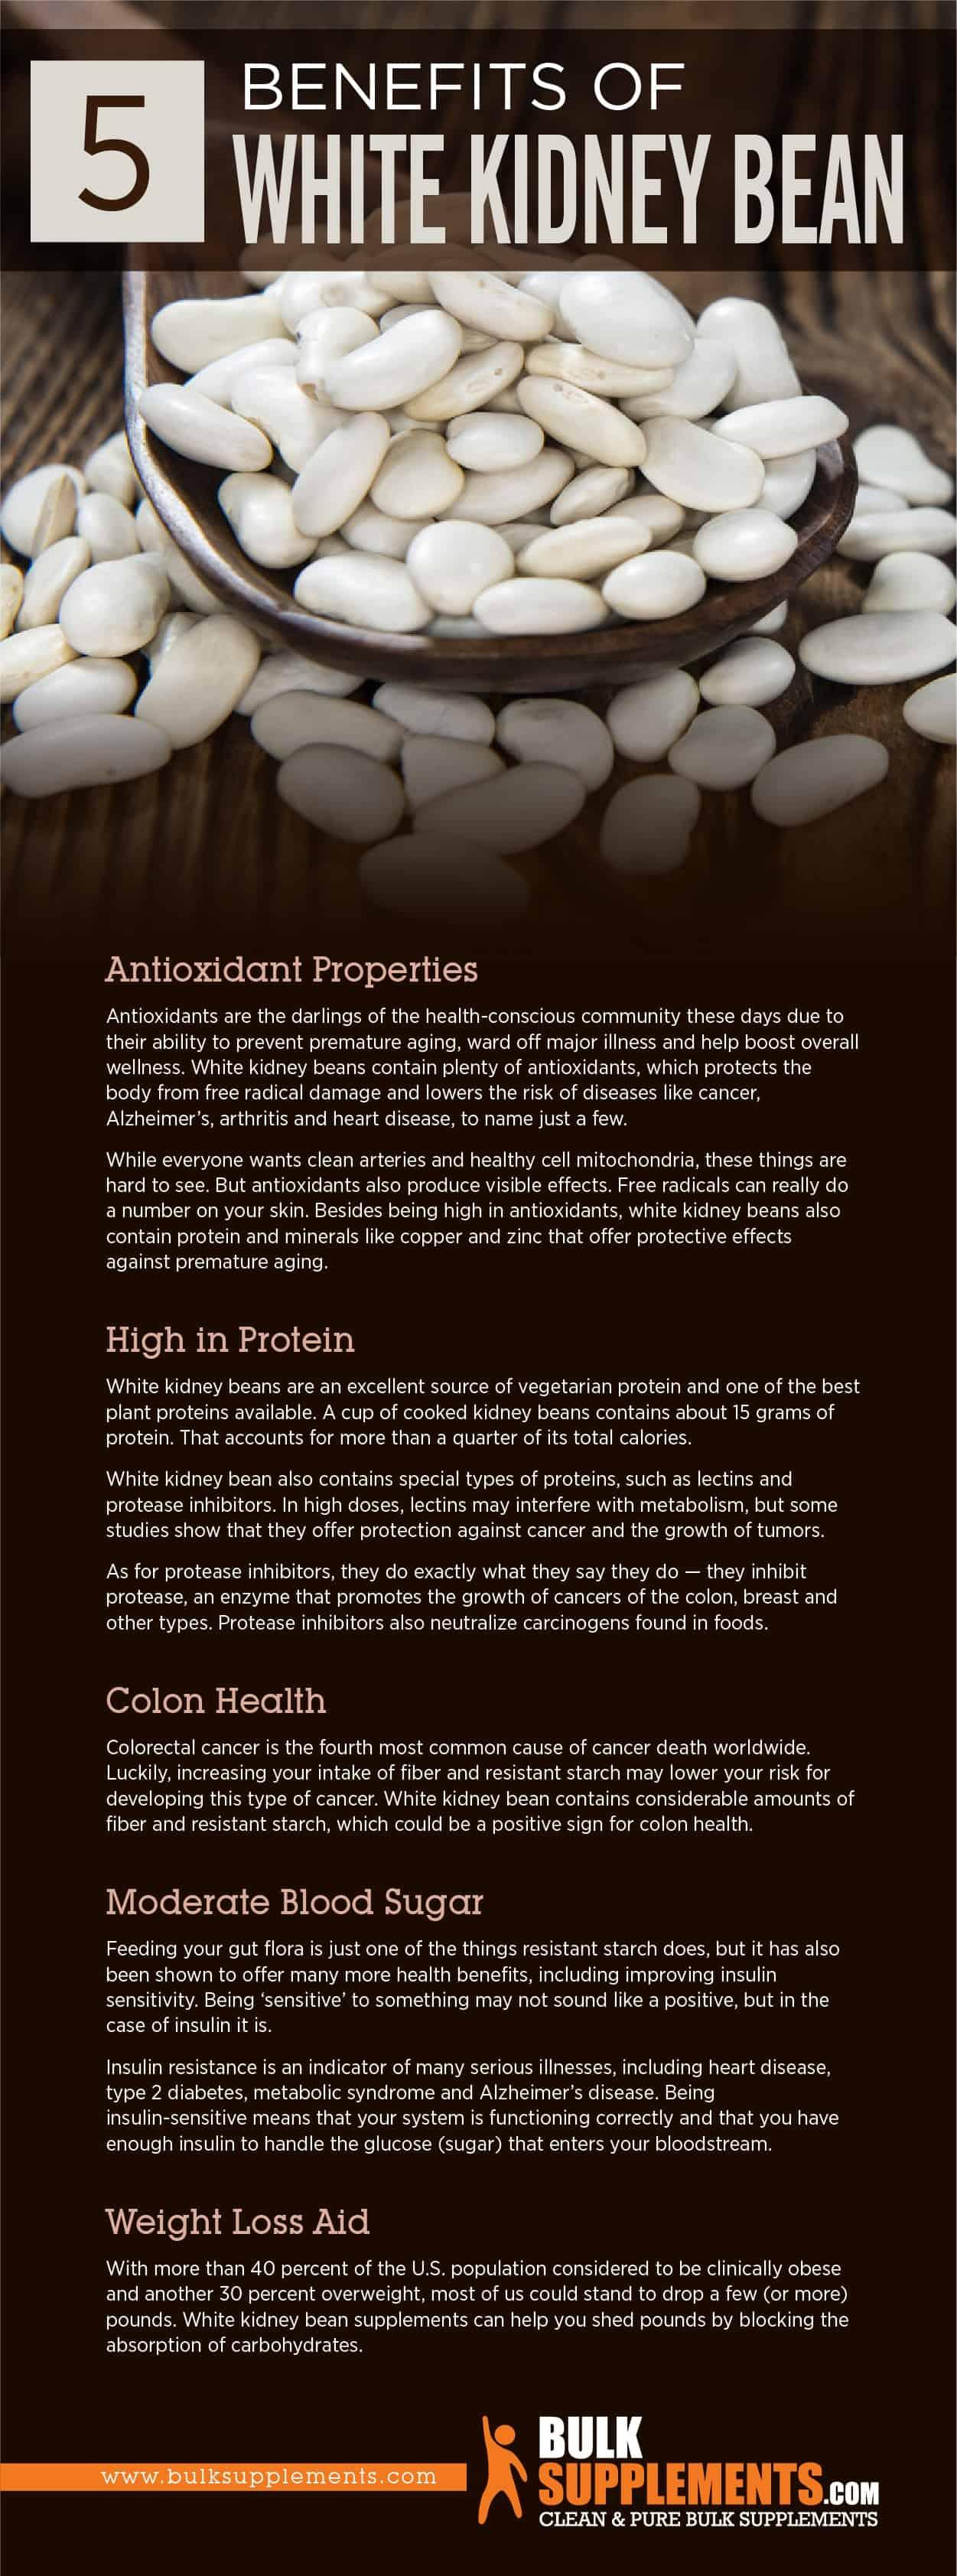 Benefits of White Kidney Bean